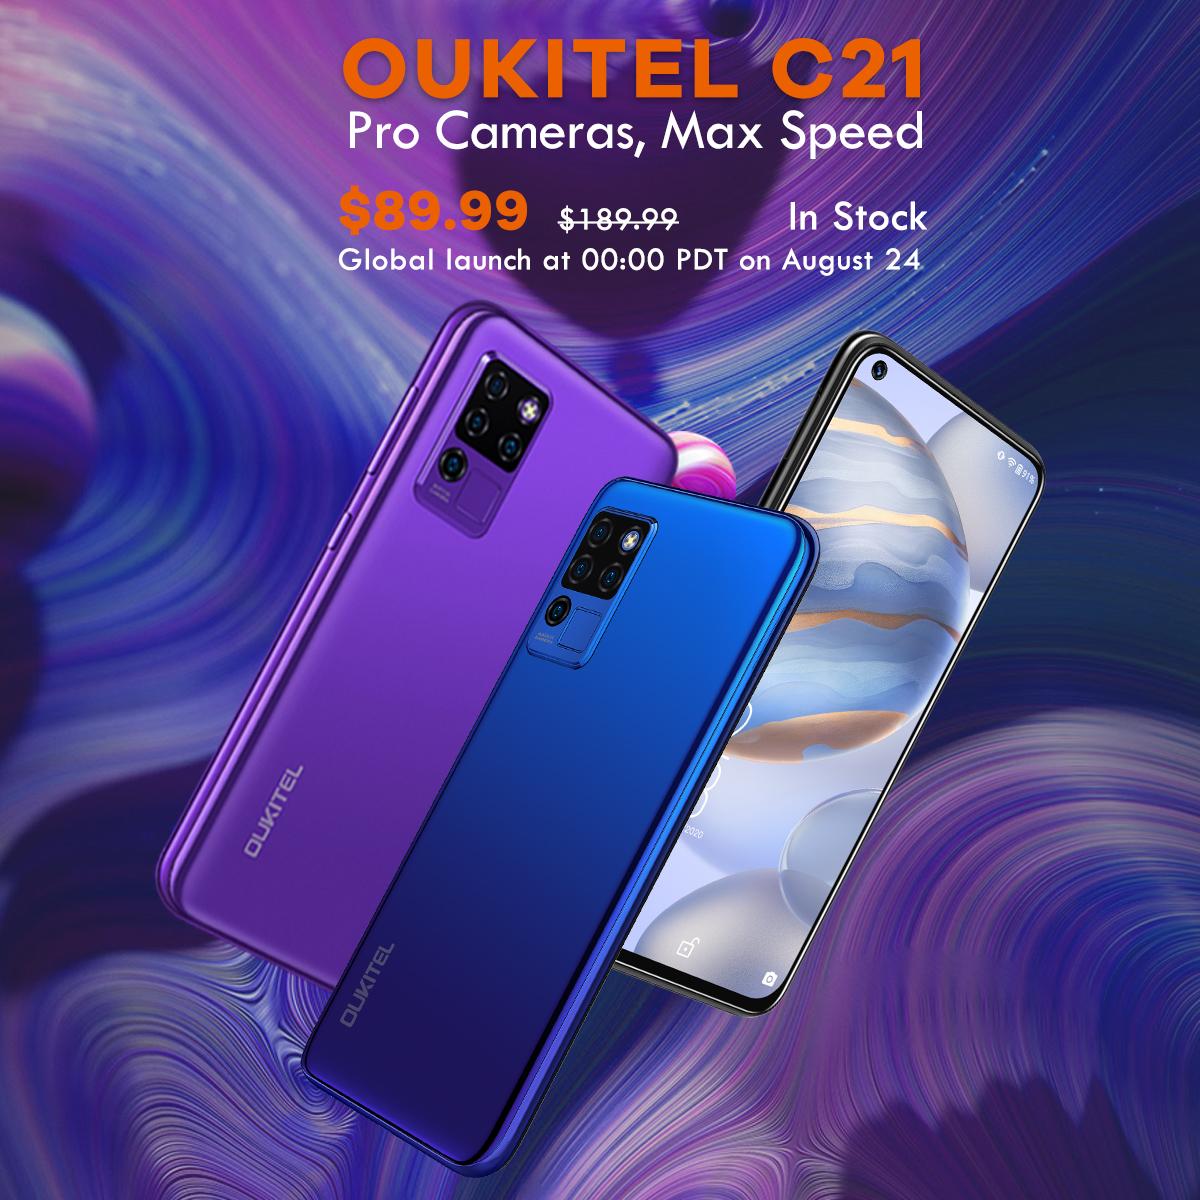 Oukitel C21